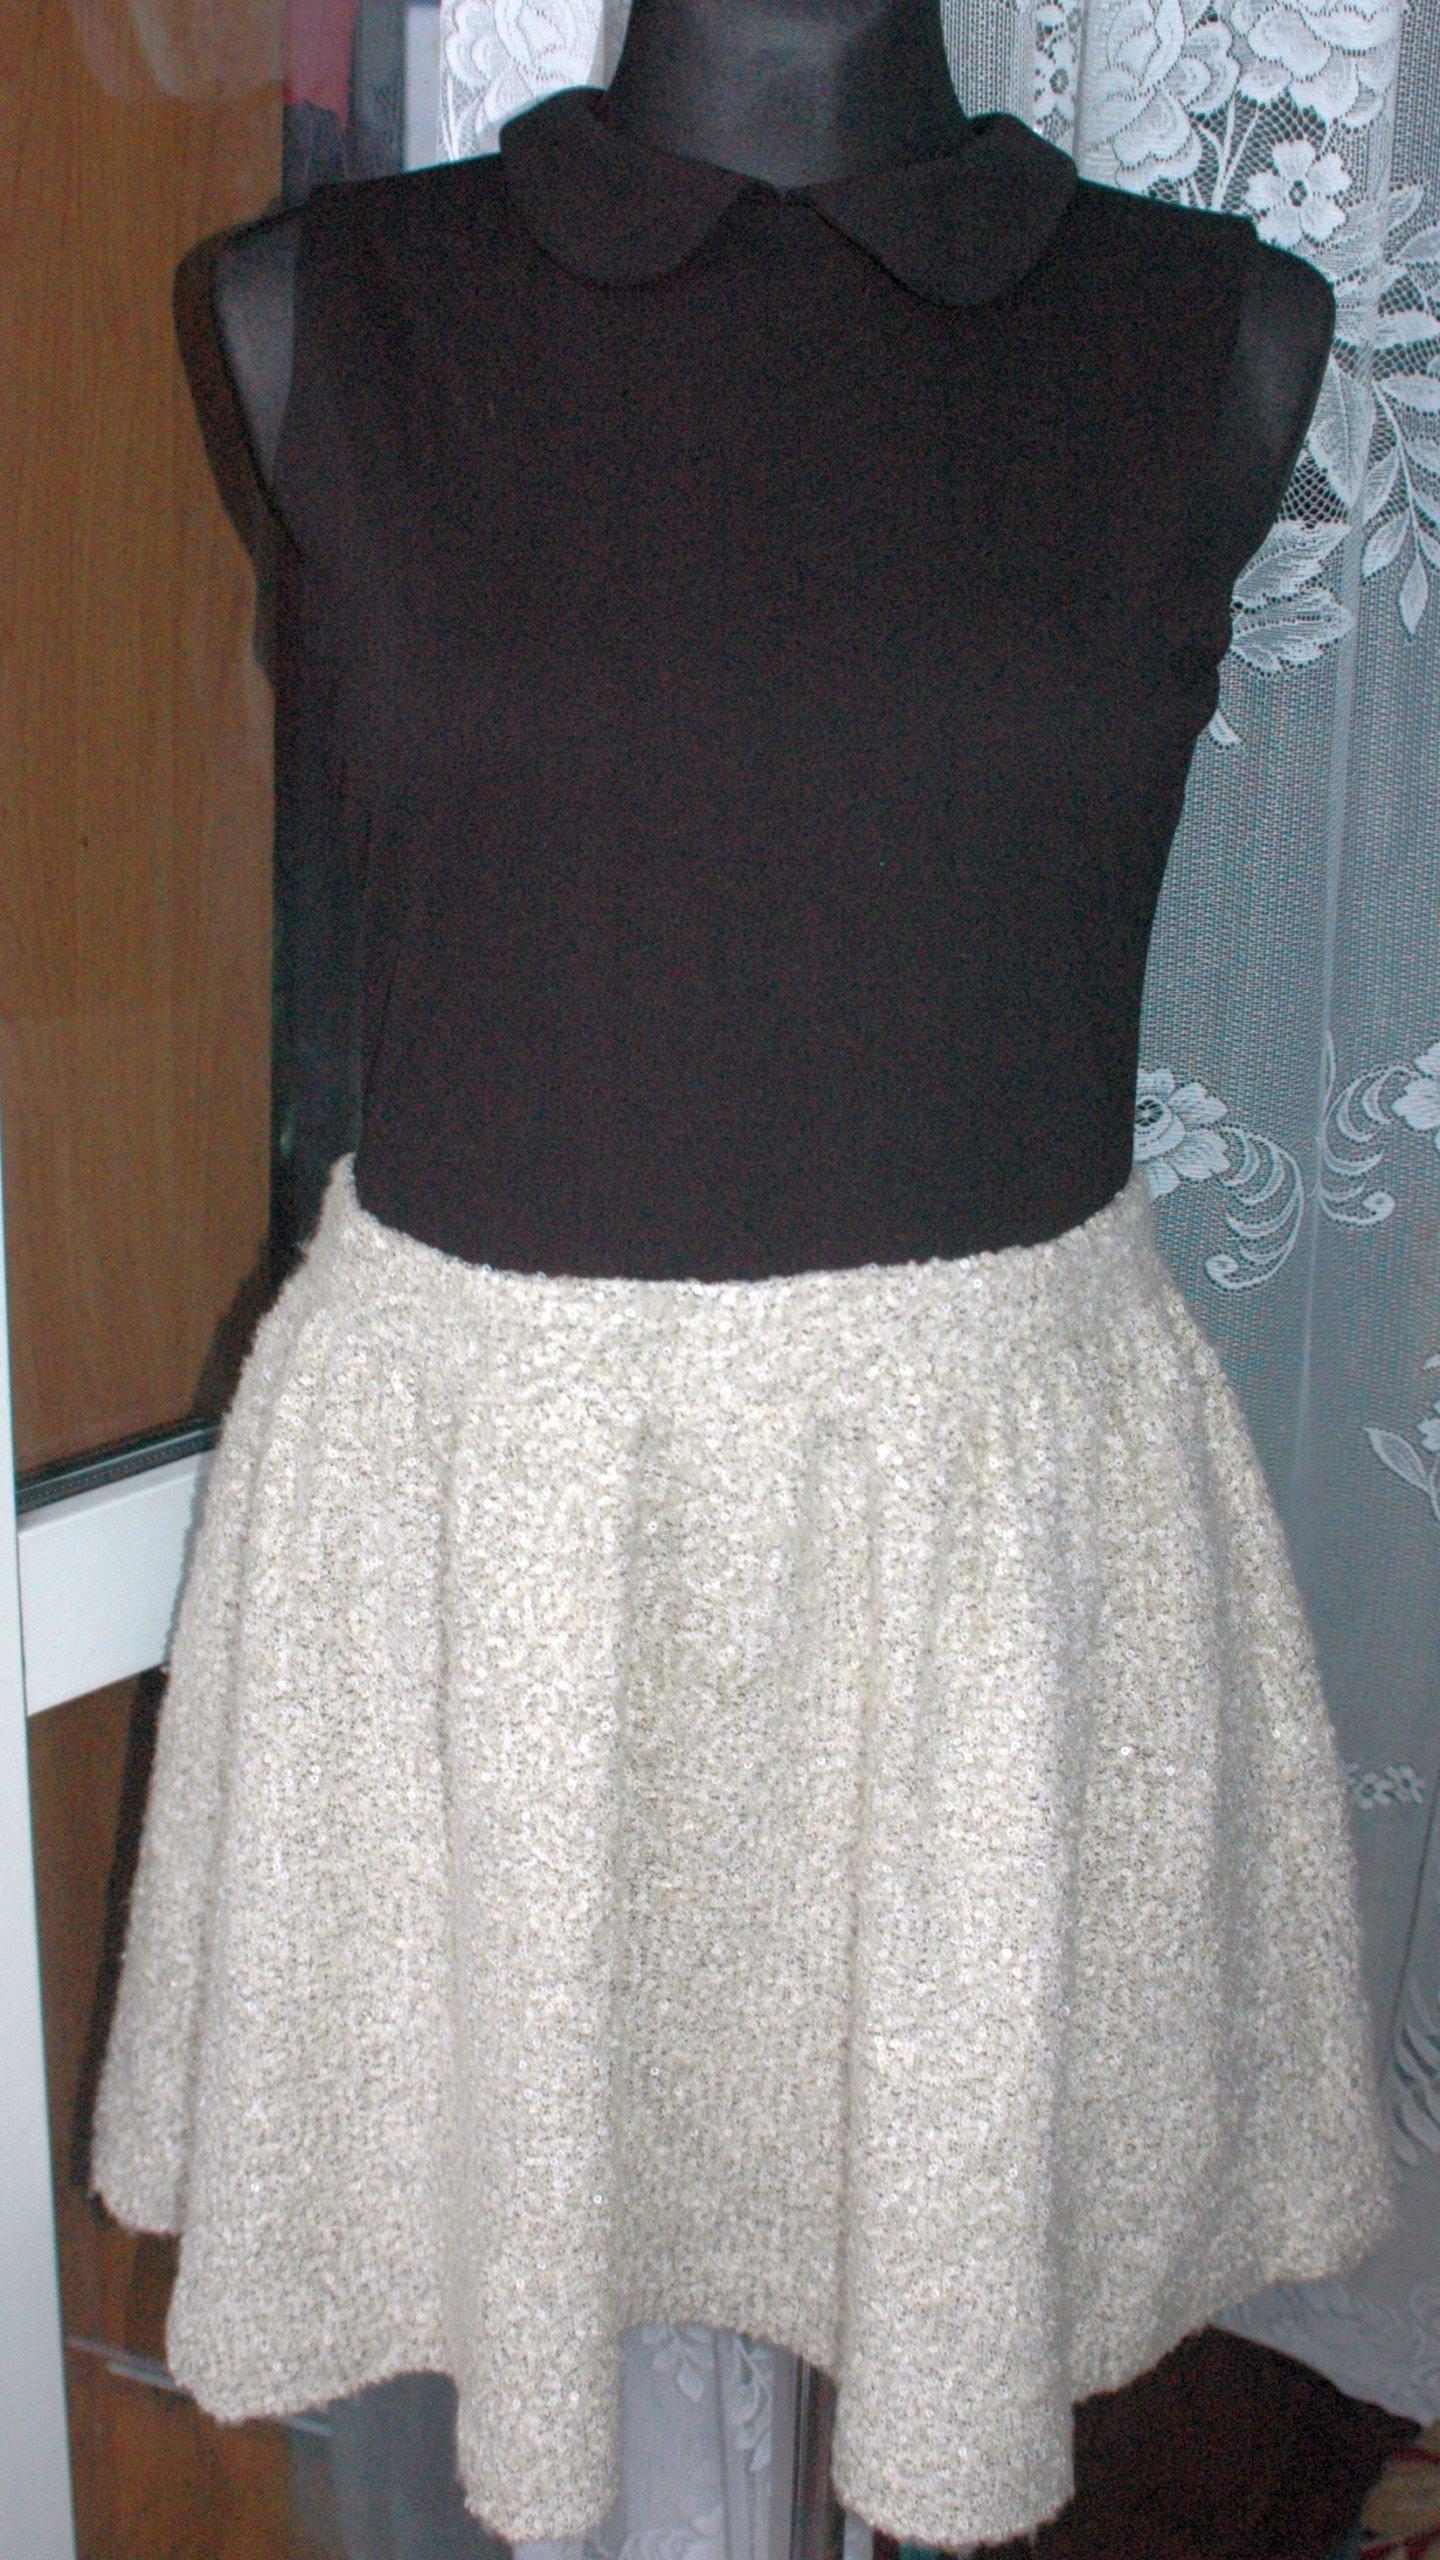 a90e563455 ZARA sliczna sukienka R 38 40 gratis ko - 7452383934 - oficjalne ...